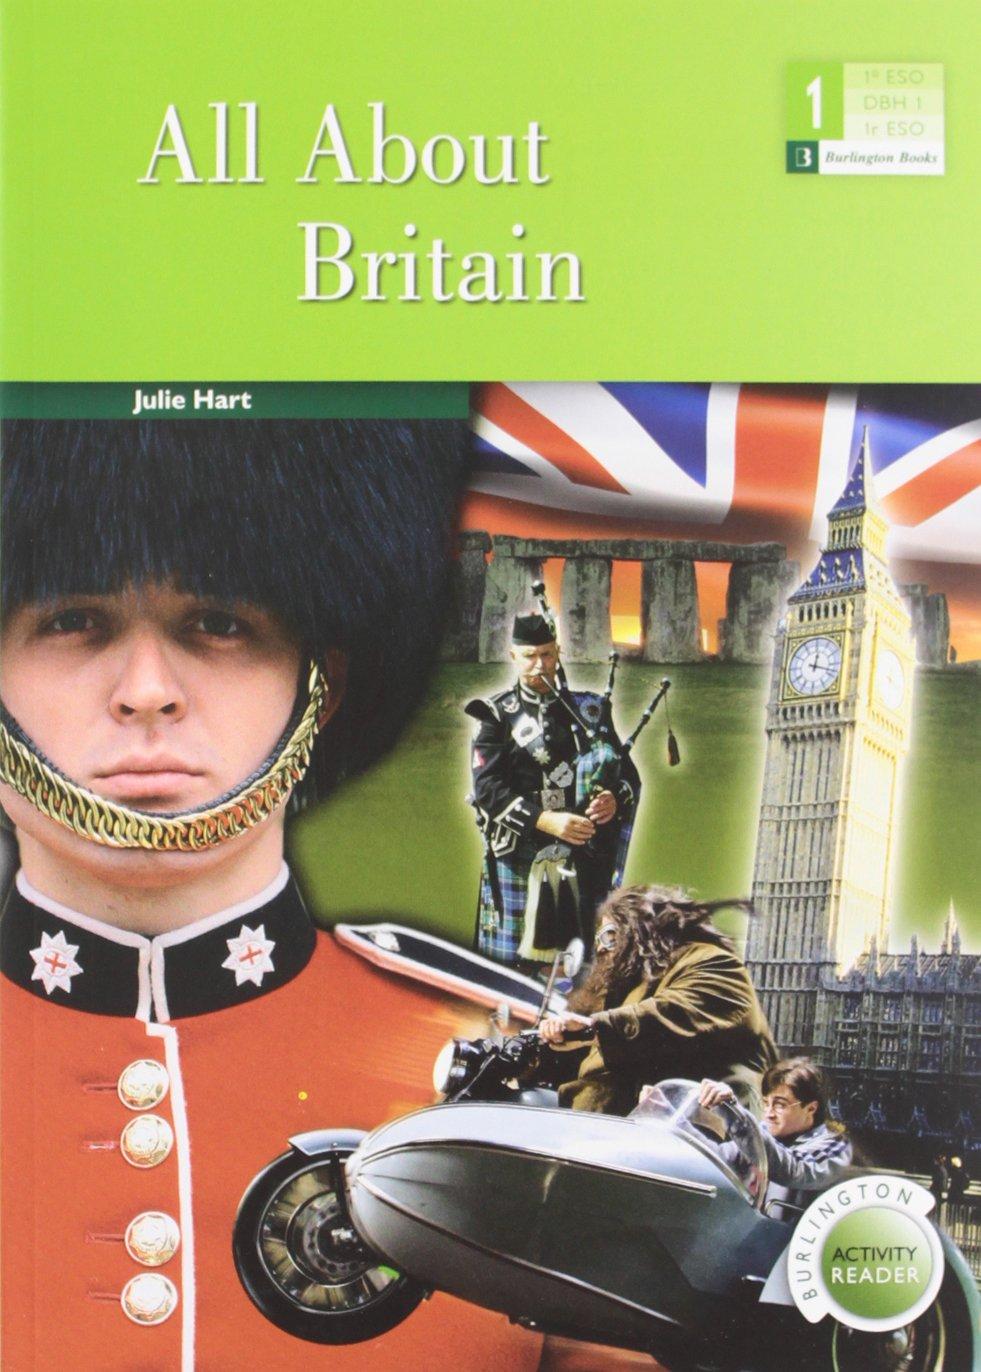 All About Britain ESO 1 Tapa blanda – 2011 Julie Hart BURLINGTON 9963485480 Lernhilfen / Abiturwissen